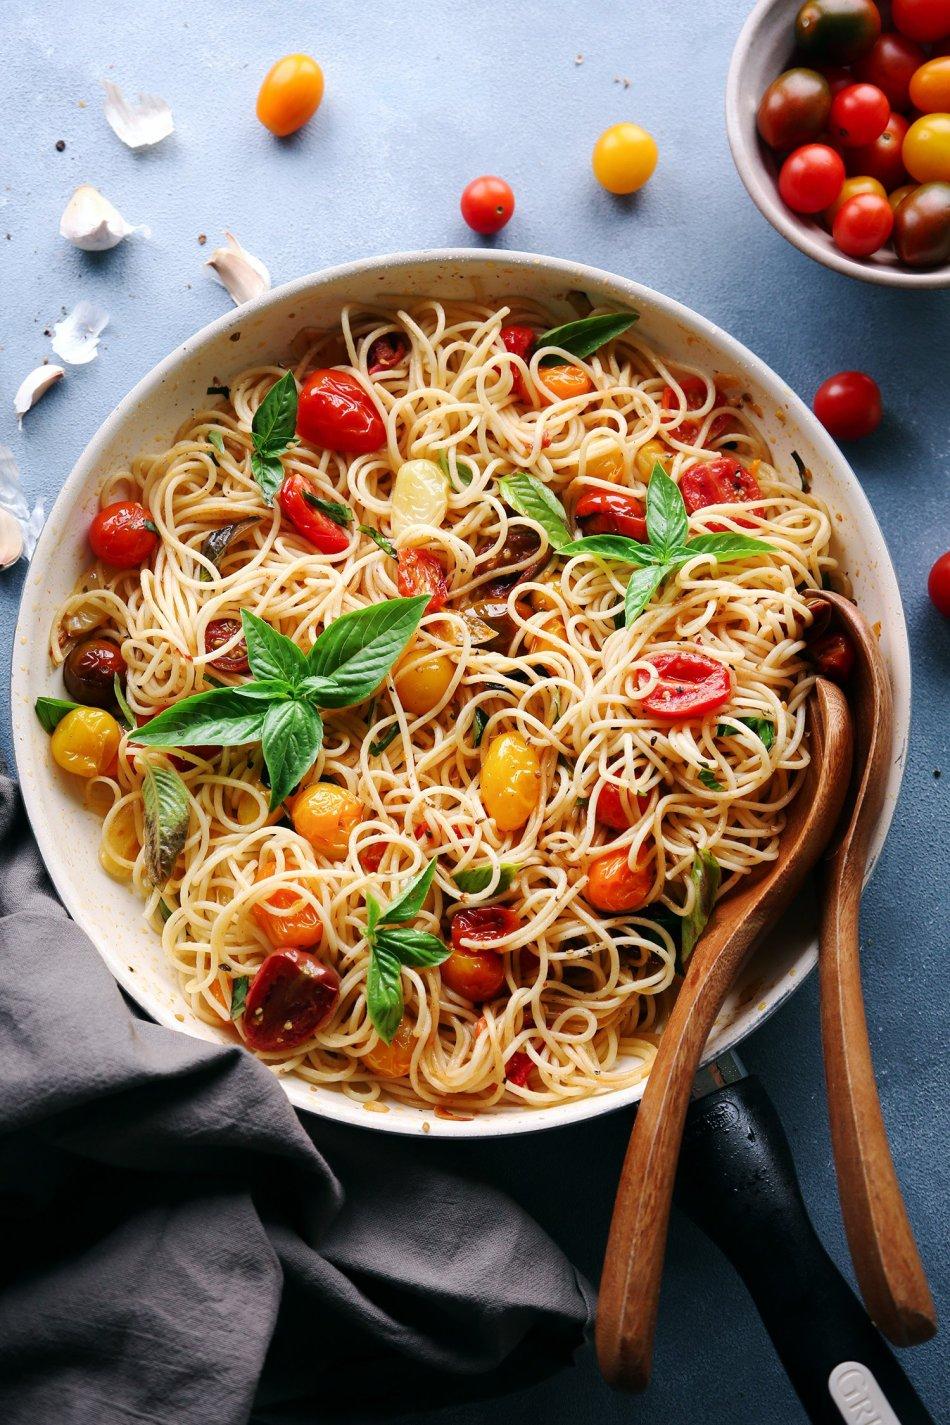 Fresh Tomato and Basil Pasta | Vegetarian with Vegan and Gluten-Free Option